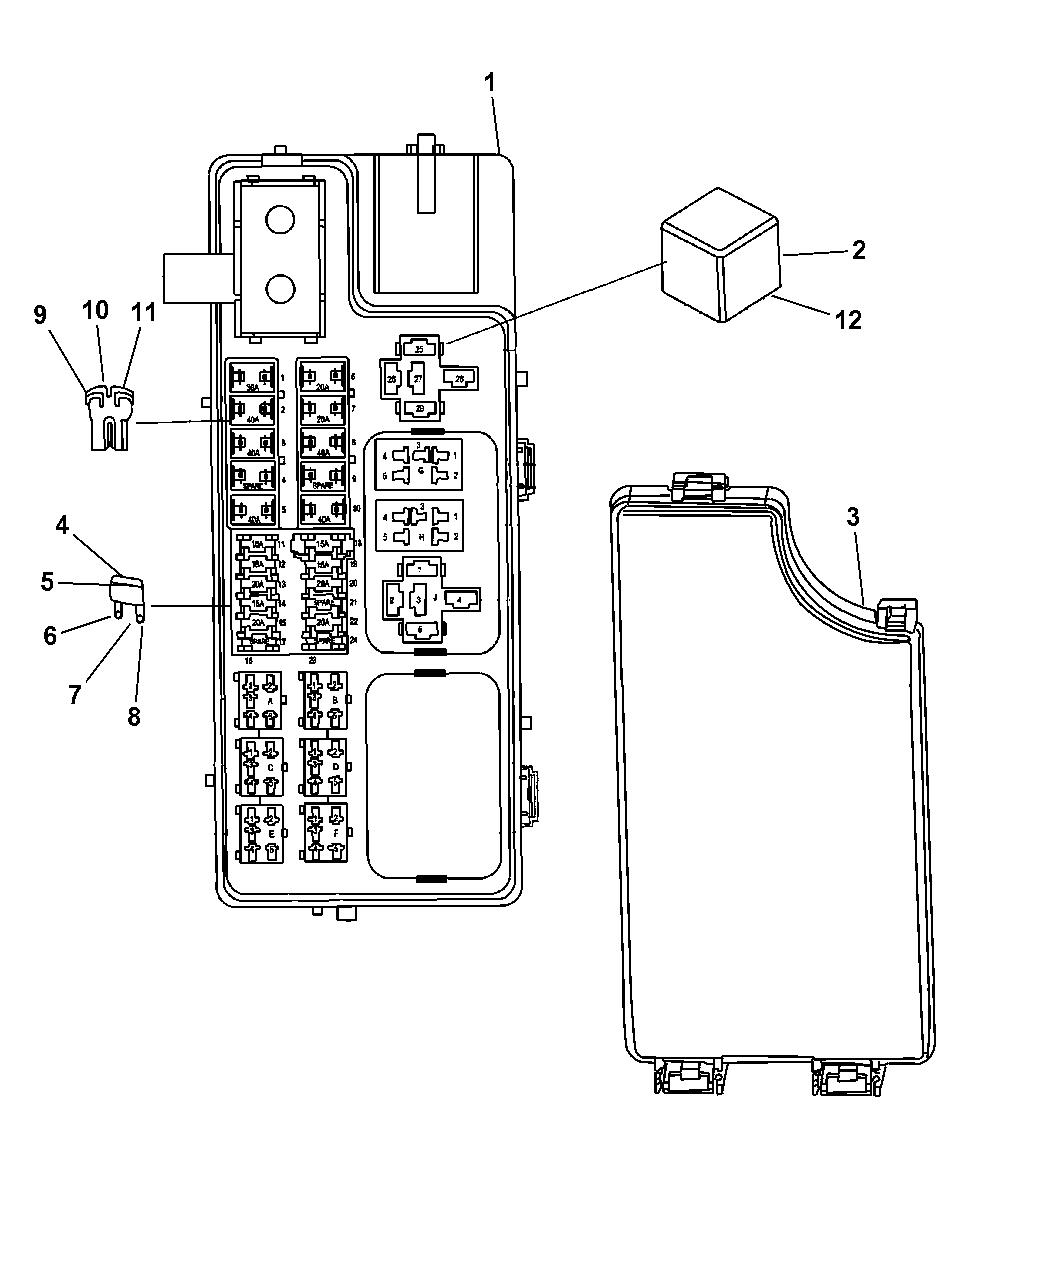 68028007AD - Genuine Mopar BLOCK-TOTALLY INTEGRATED POWER